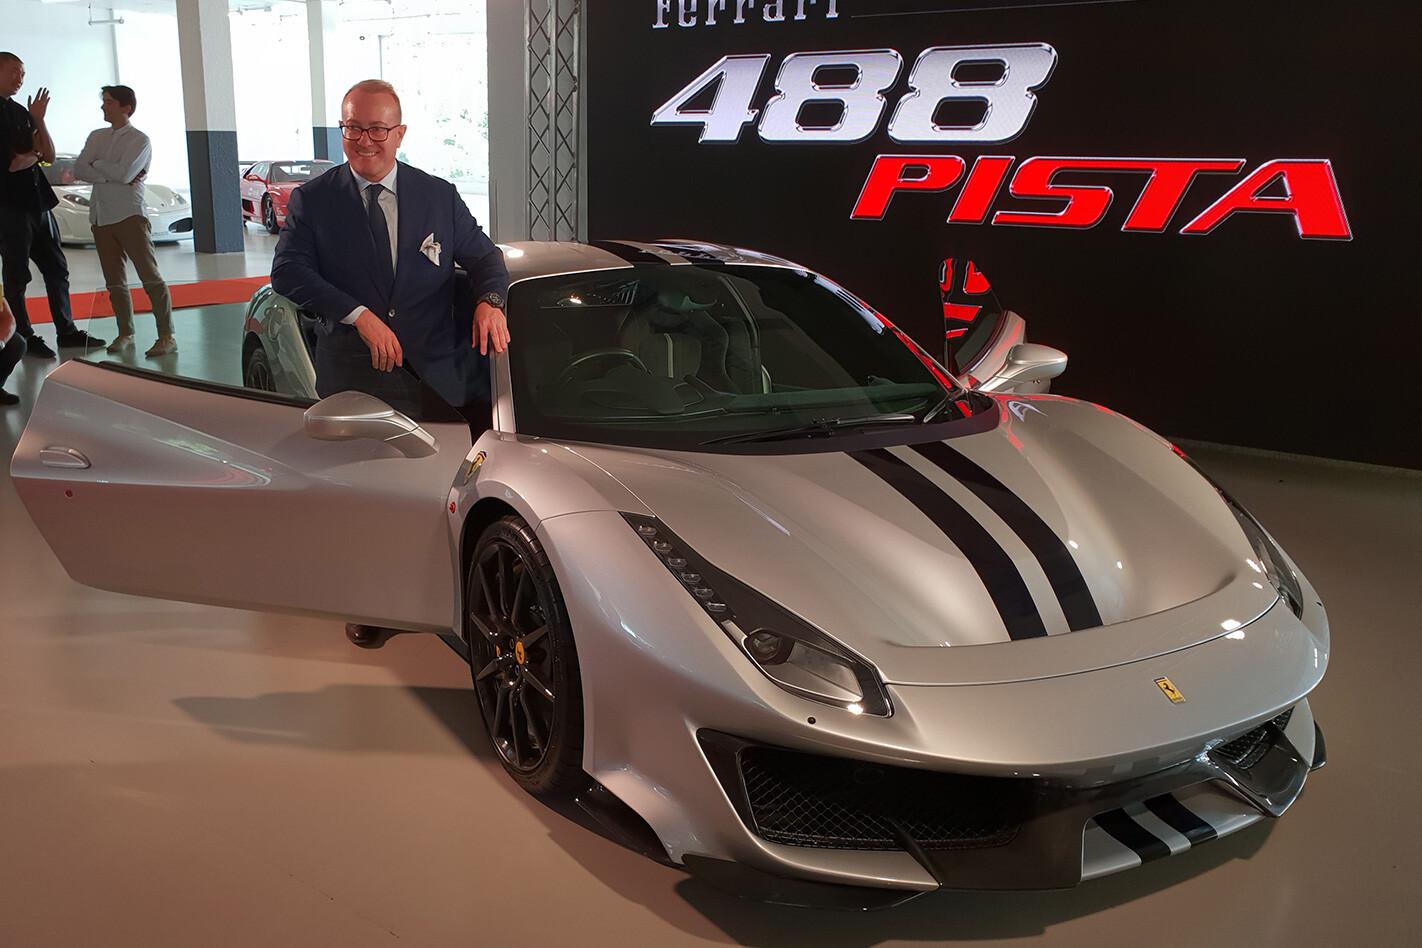 Ferrari 488 Pista Lead Jpg